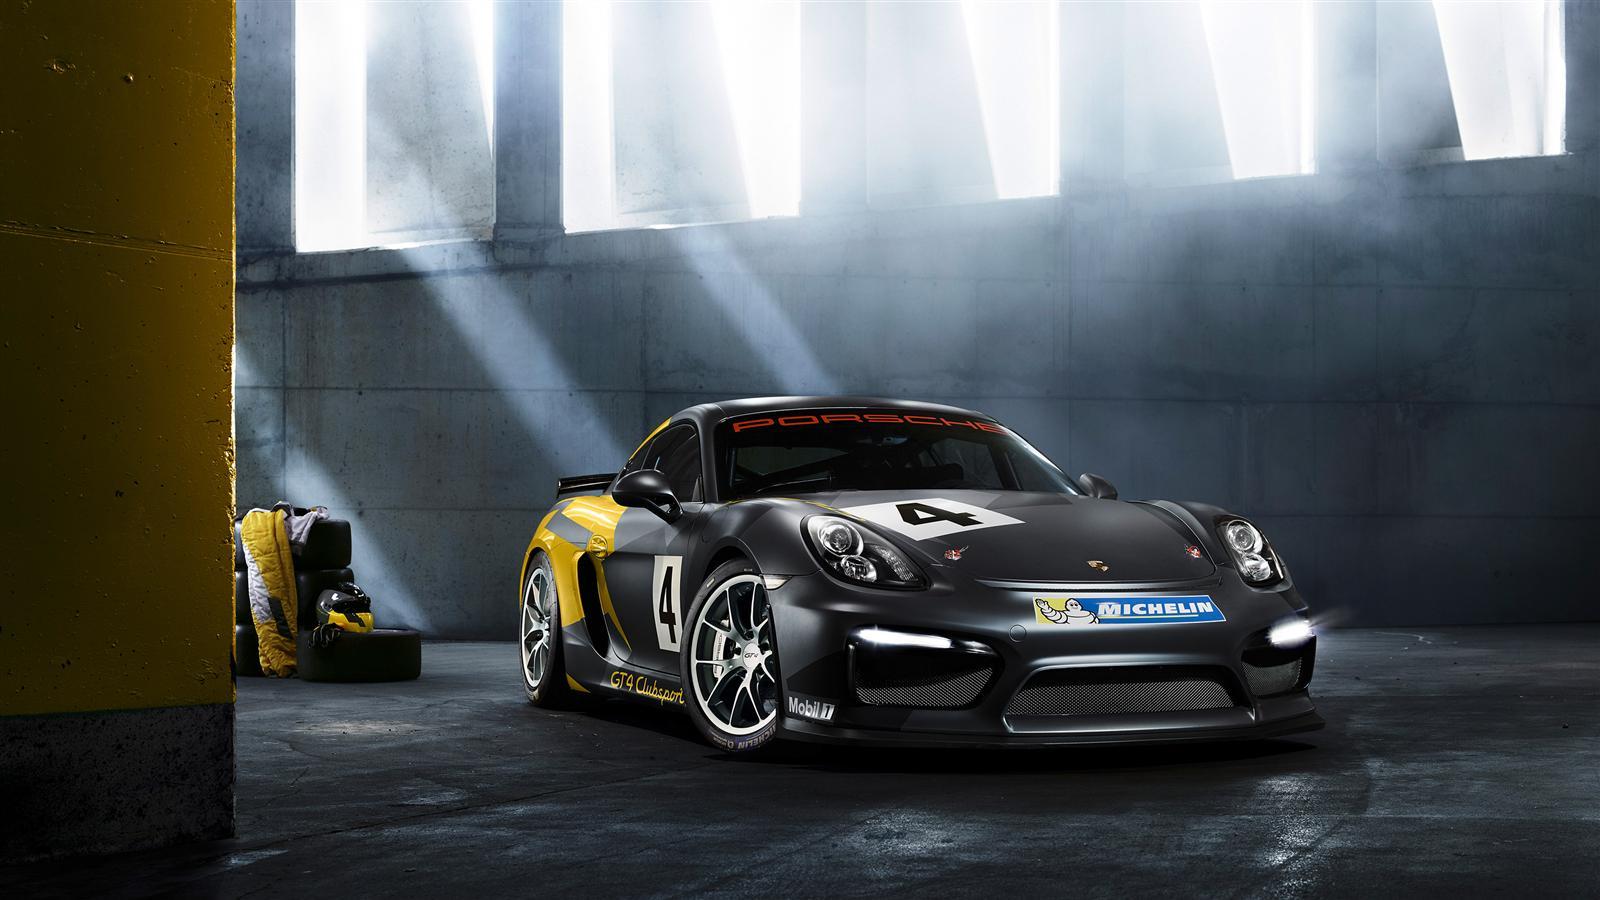 Porsche Cayman GT4 Clubsport - 2015 - profil avant / front side-face